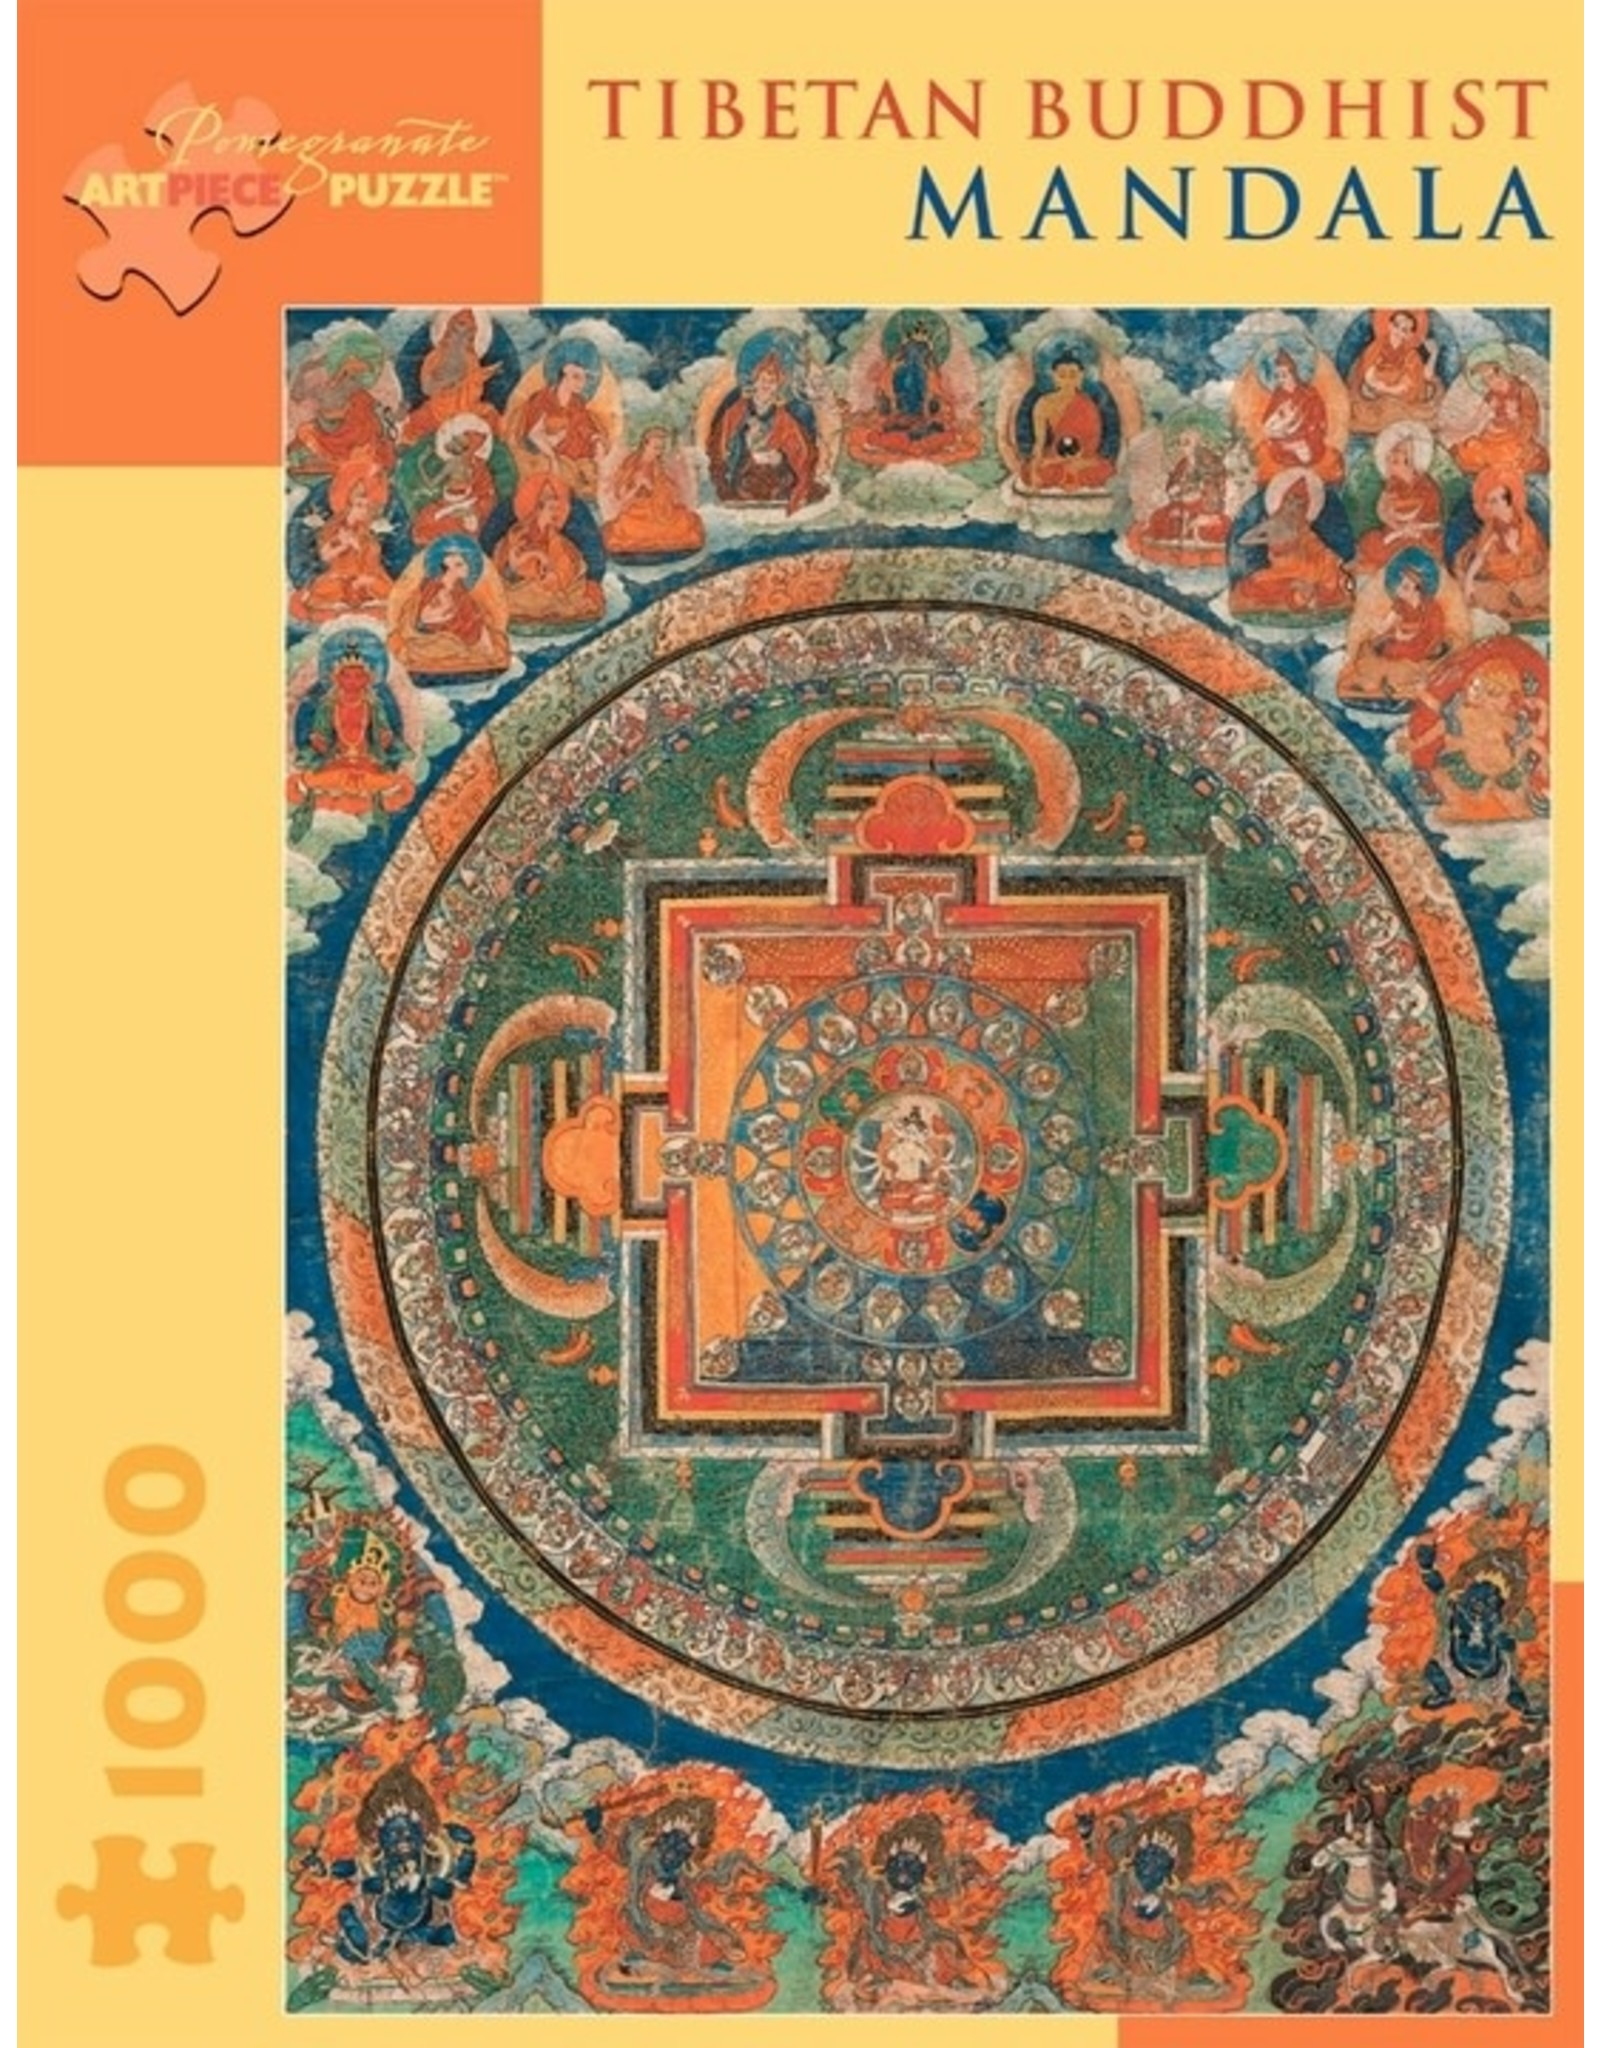 TIBETAN BUDDHIST MANDALA1000 PIECE JIGSAW PUZZLE